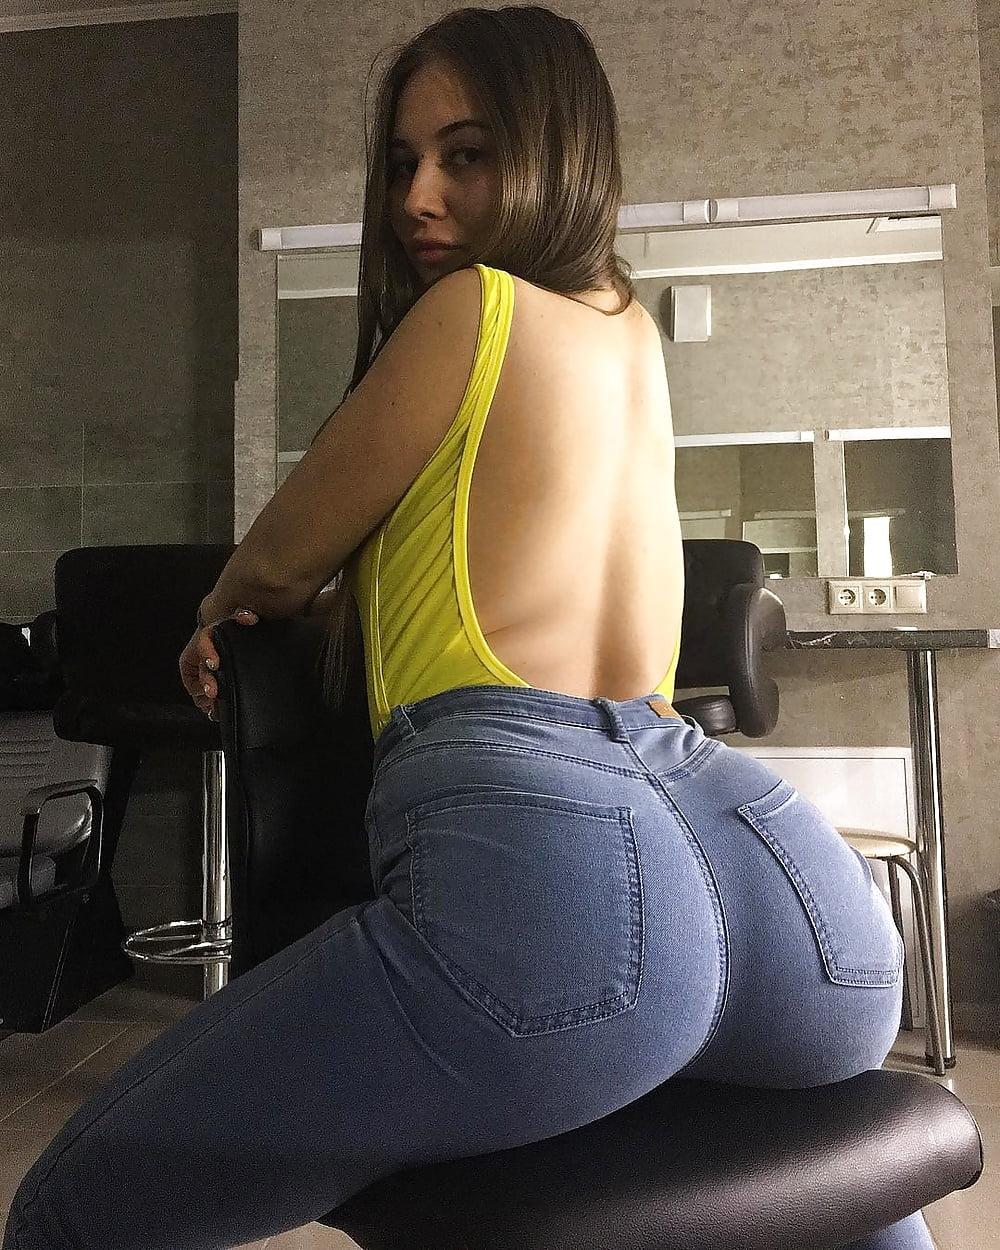 Butt archives